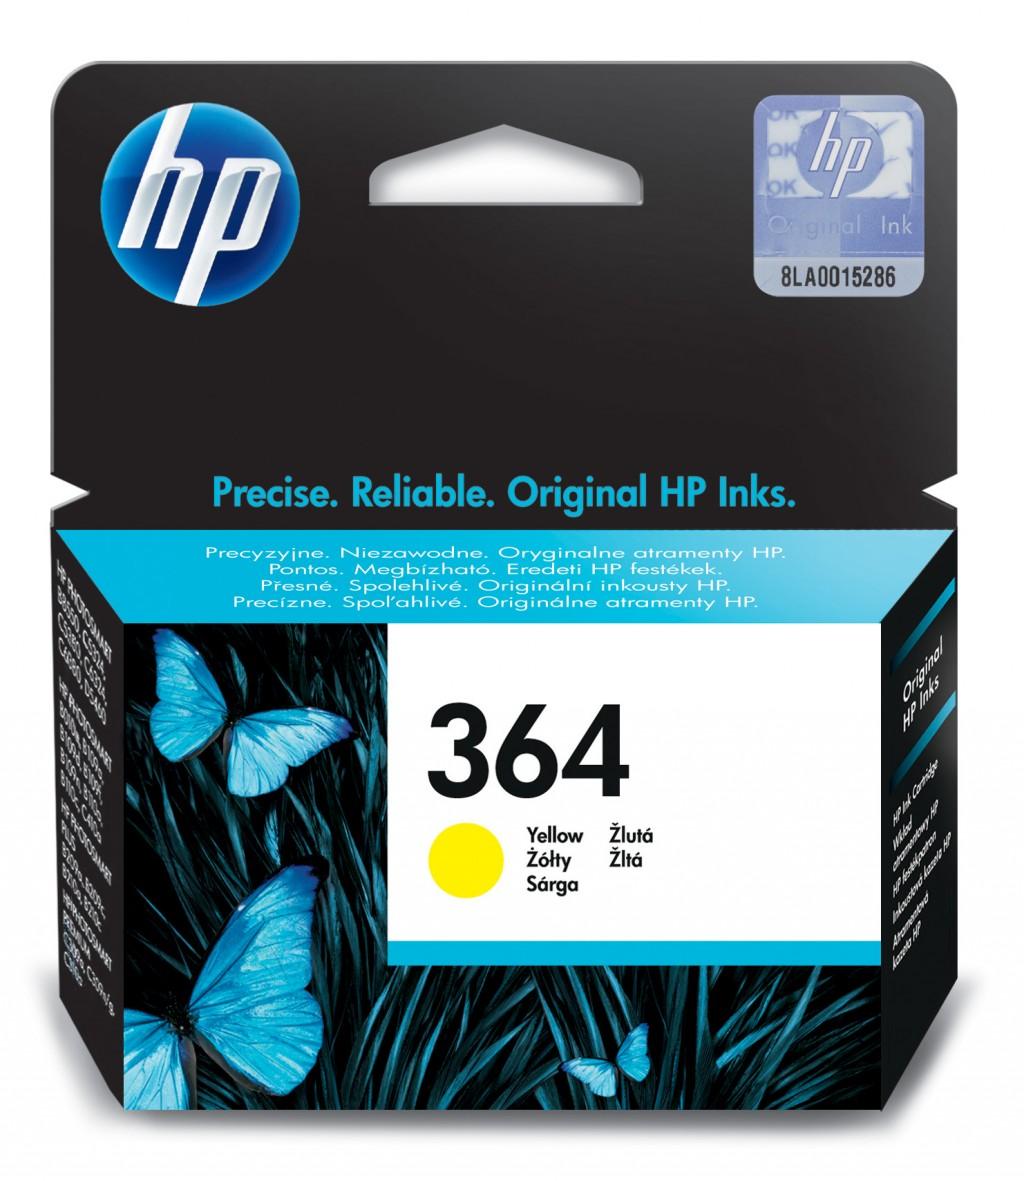 HP CB320EE ink cartridge No. 364, yellow